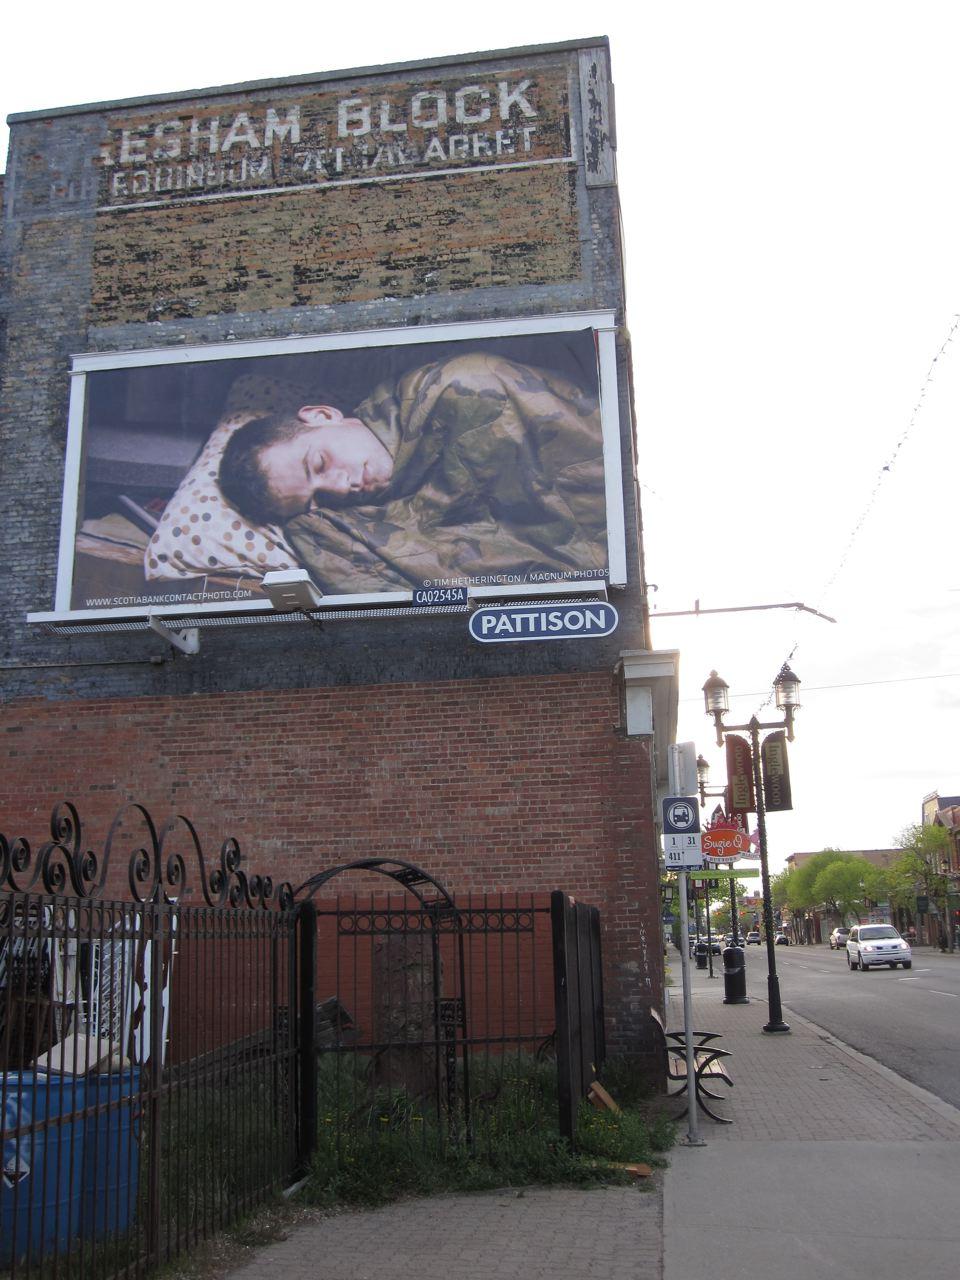 Tim Hetherington, Sleeping Soldiers, 2012 in Calgary, AB. Image credit Aisia Salo